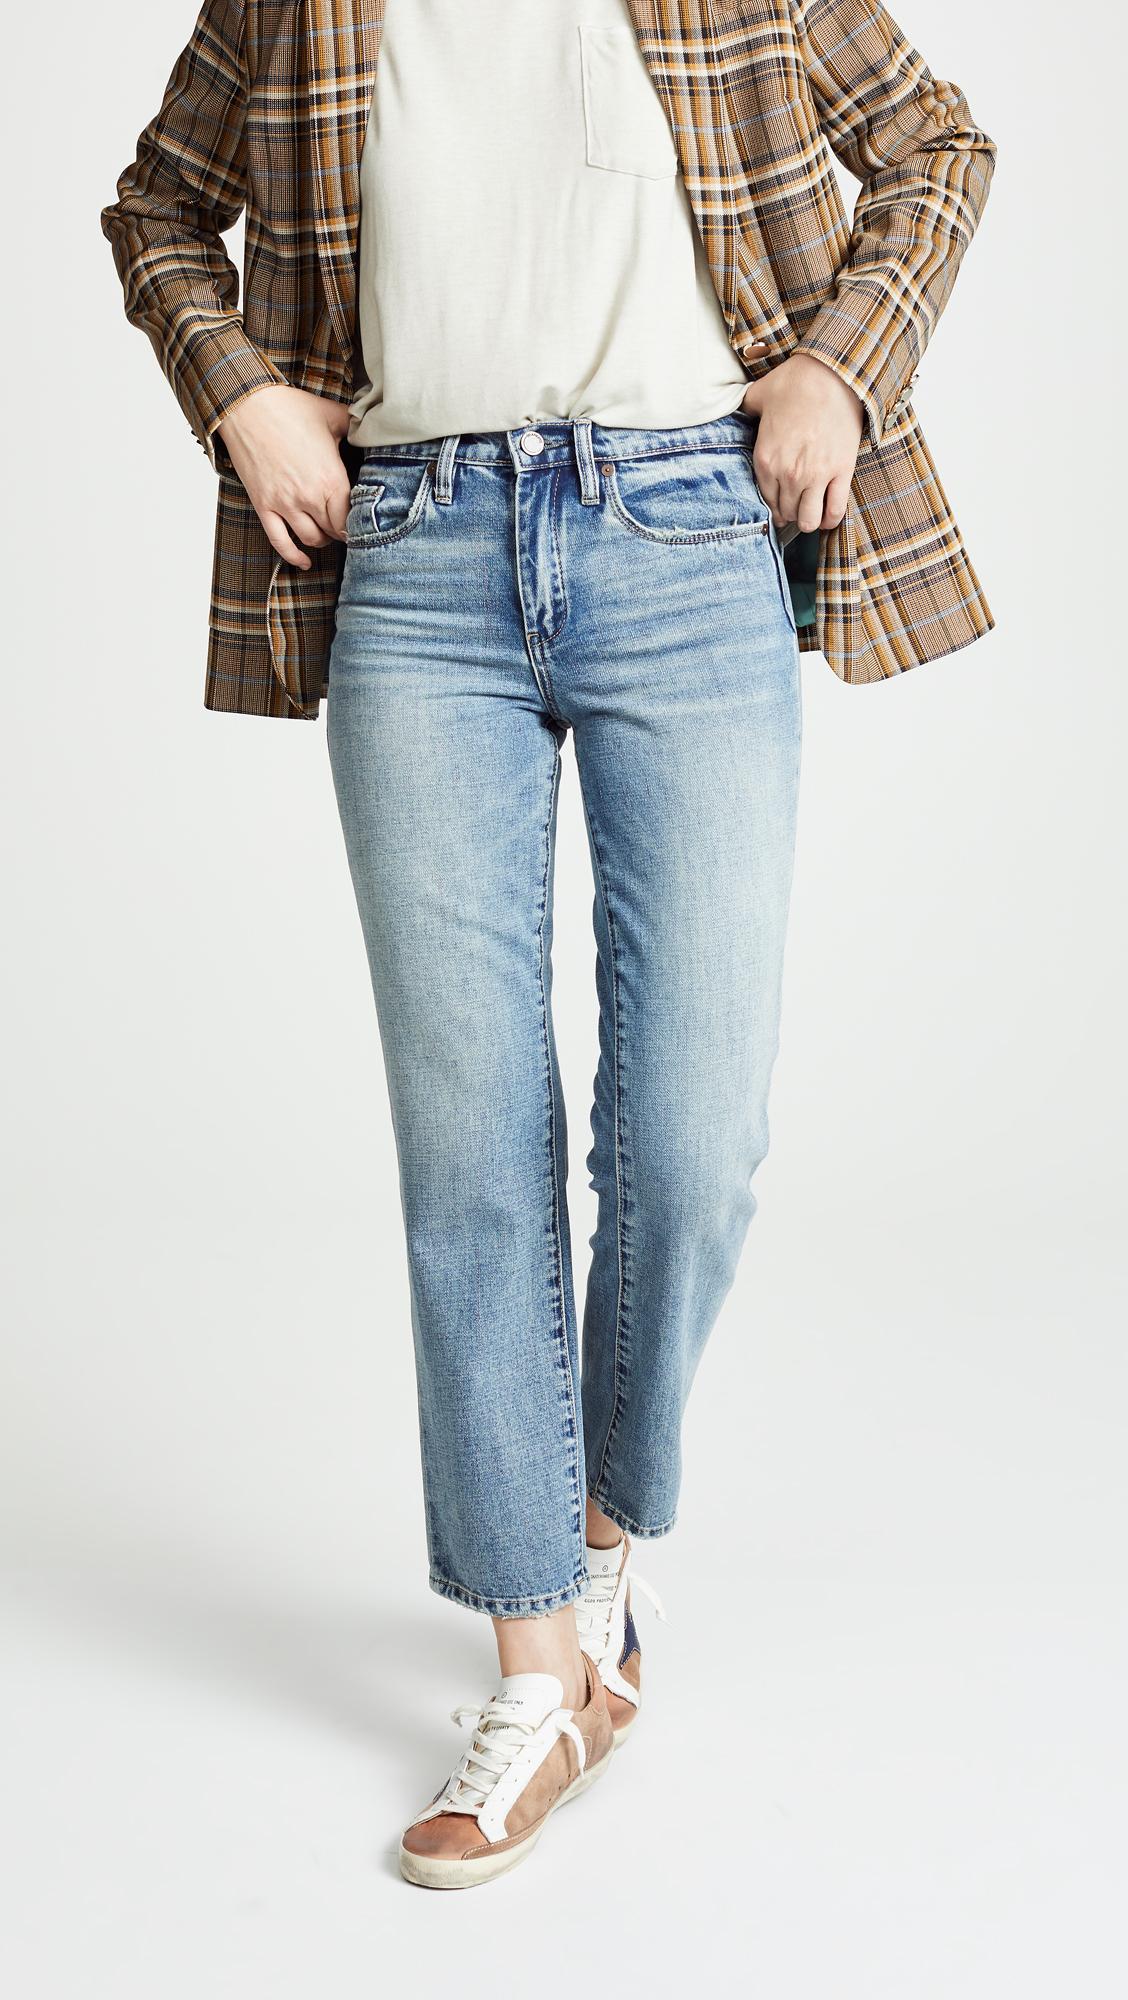 blank jeans, straight-leg jeans, cropped jeans, vintage washed denim